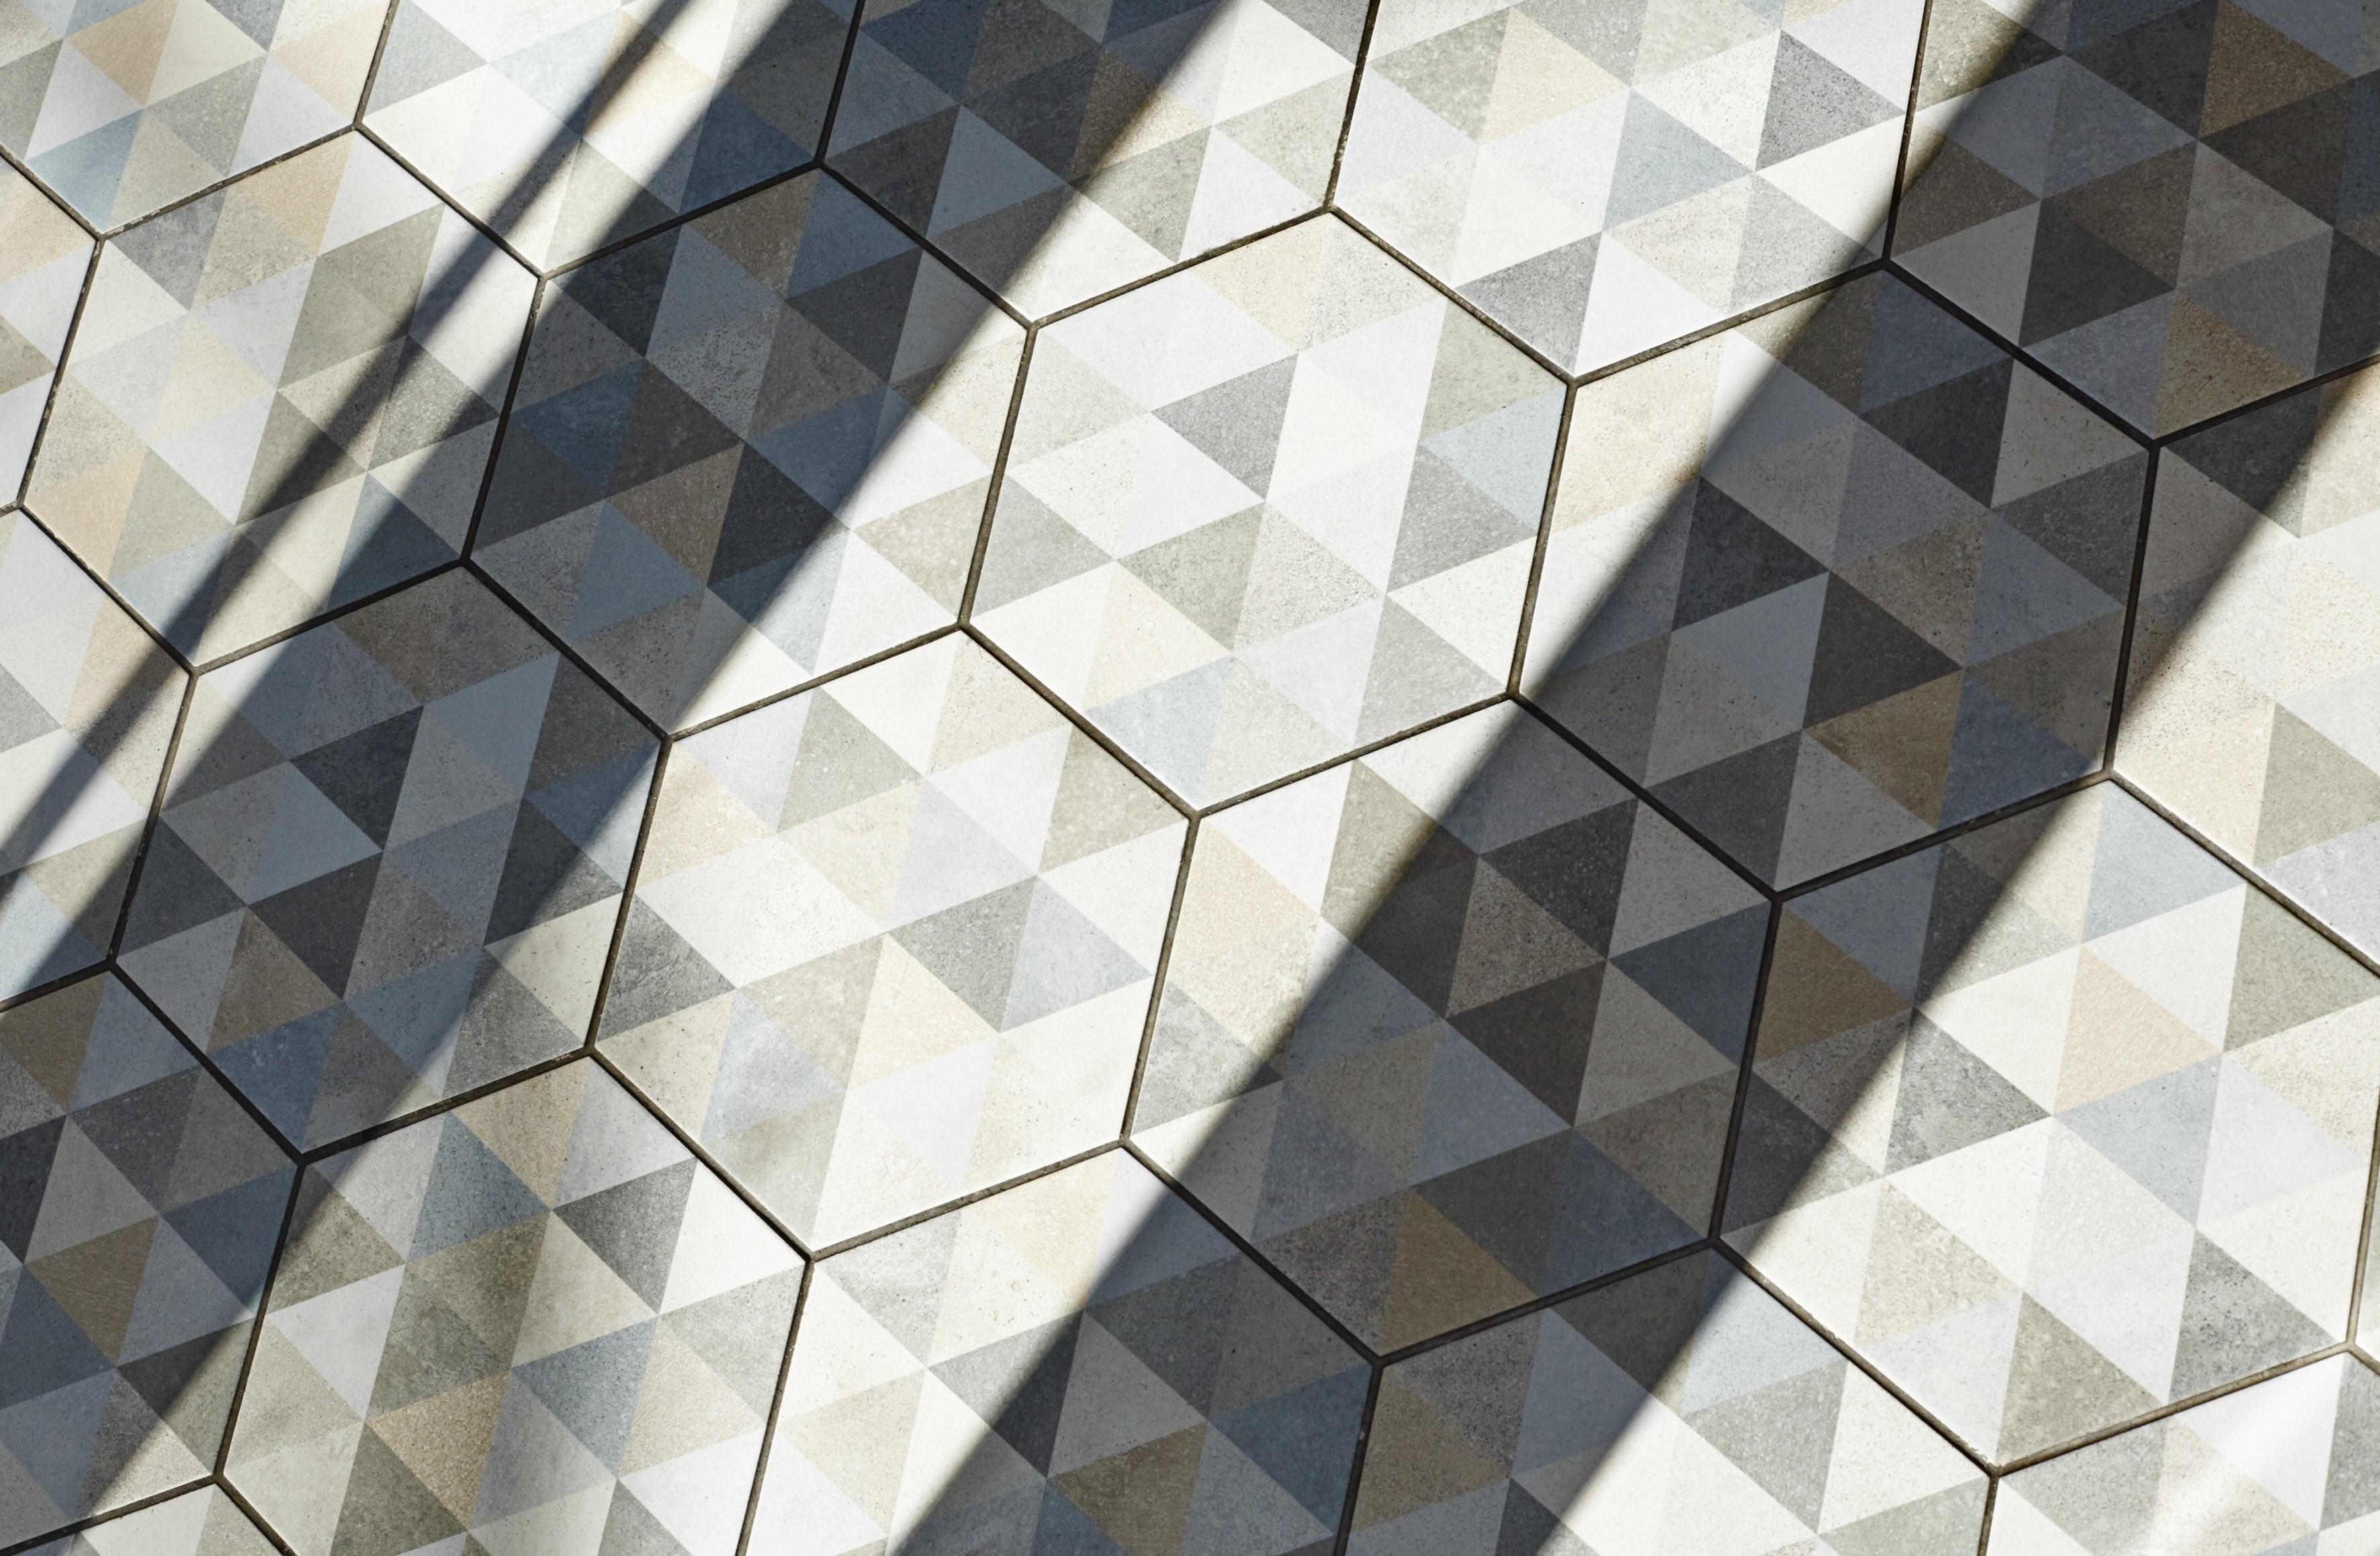 Glass Pavilion Studio Verve Architects